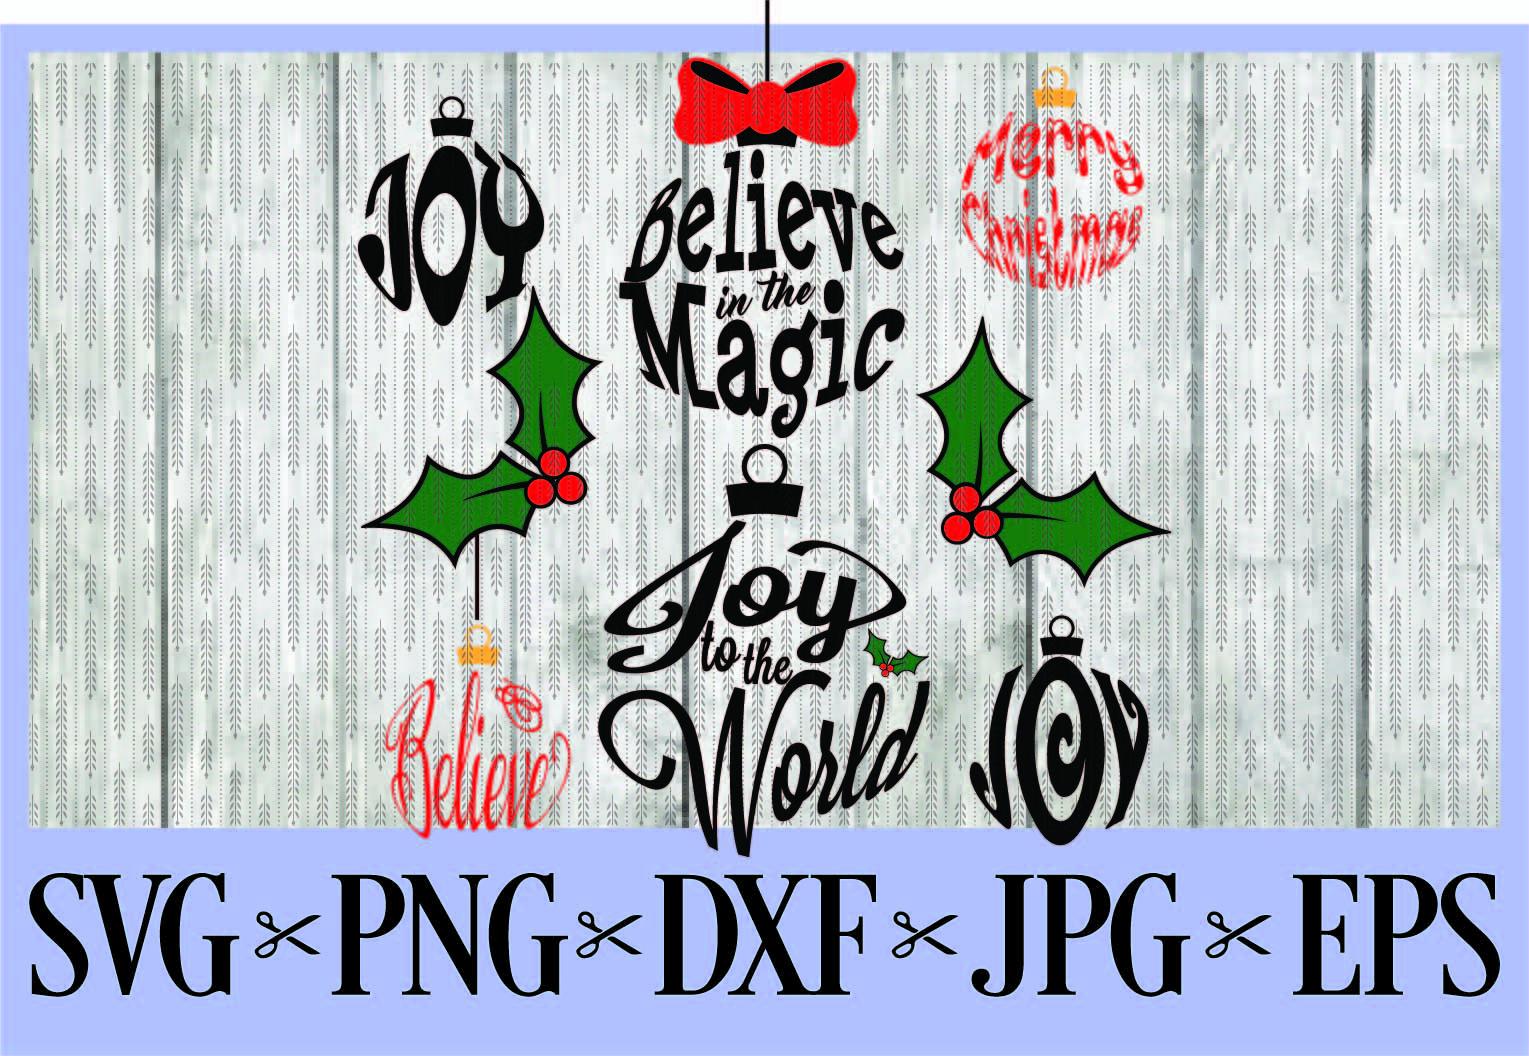 Merry Christmas Ornament Svg.Christmas Ornaments Balls Svg Png Eps Dxf Jpg Merry Christmas